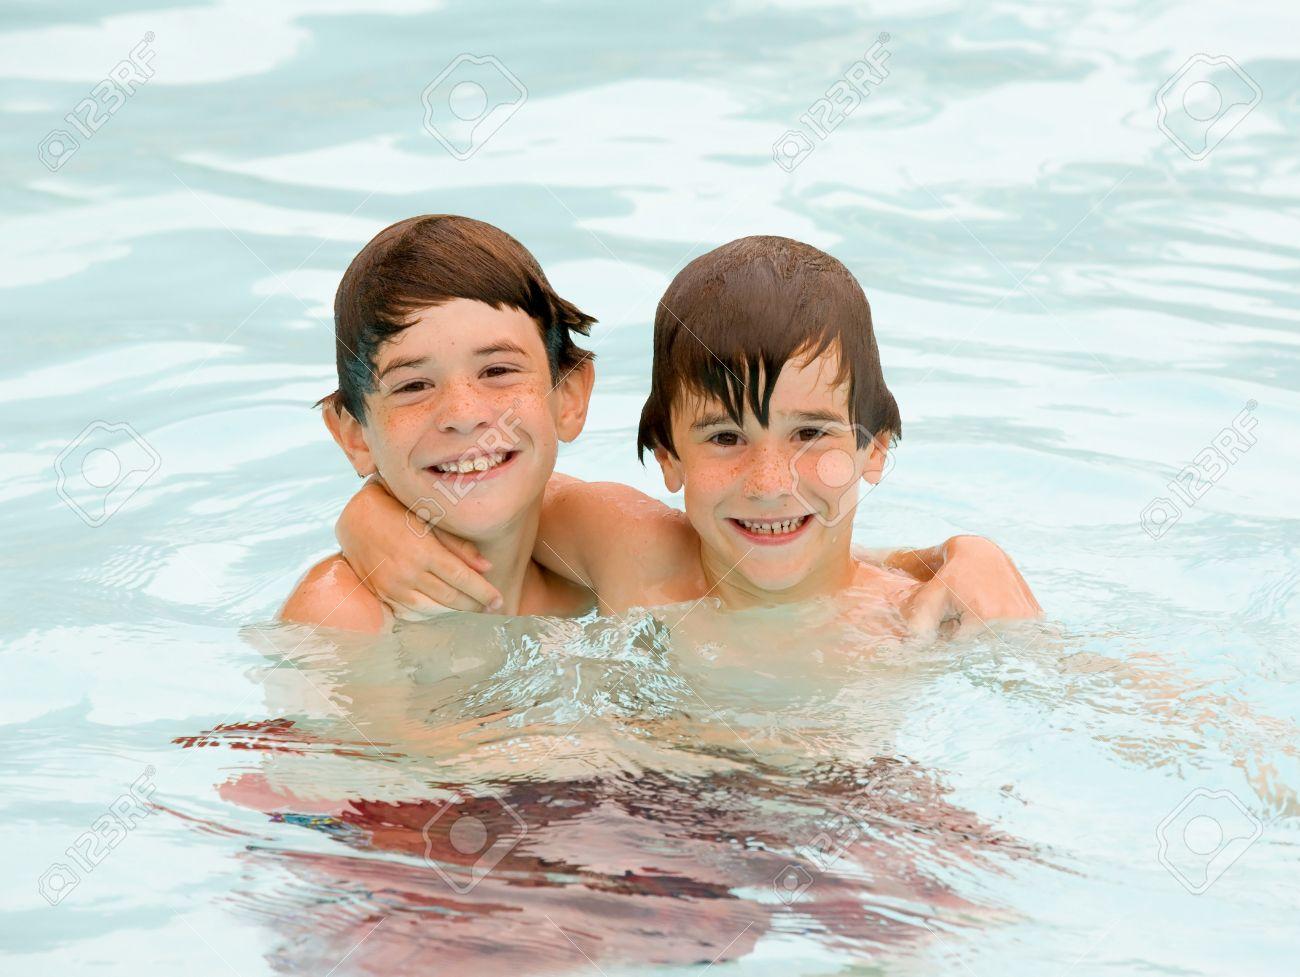 Boys Having a Fun Time at the Pool - 4568805